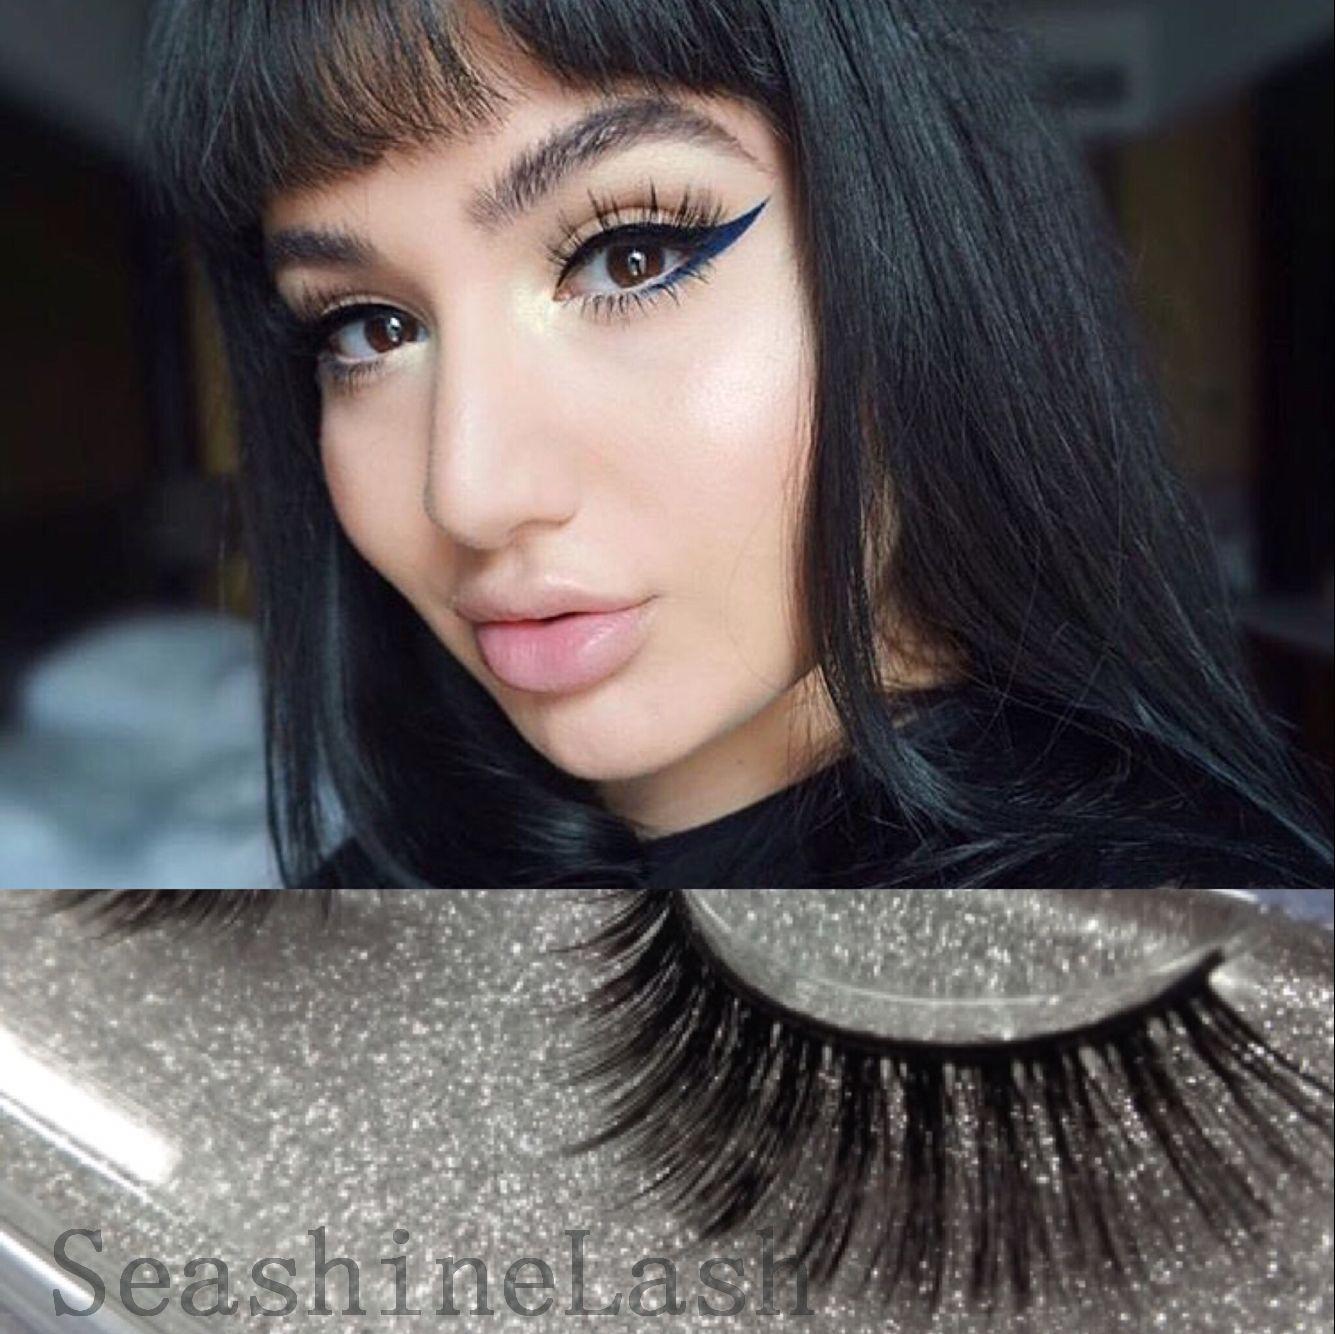 Perfect 3D Beauty Makeup Grafting Fake False Eyelashes Natural silk Eye Lashes for Eyelash Extension Hot Sale